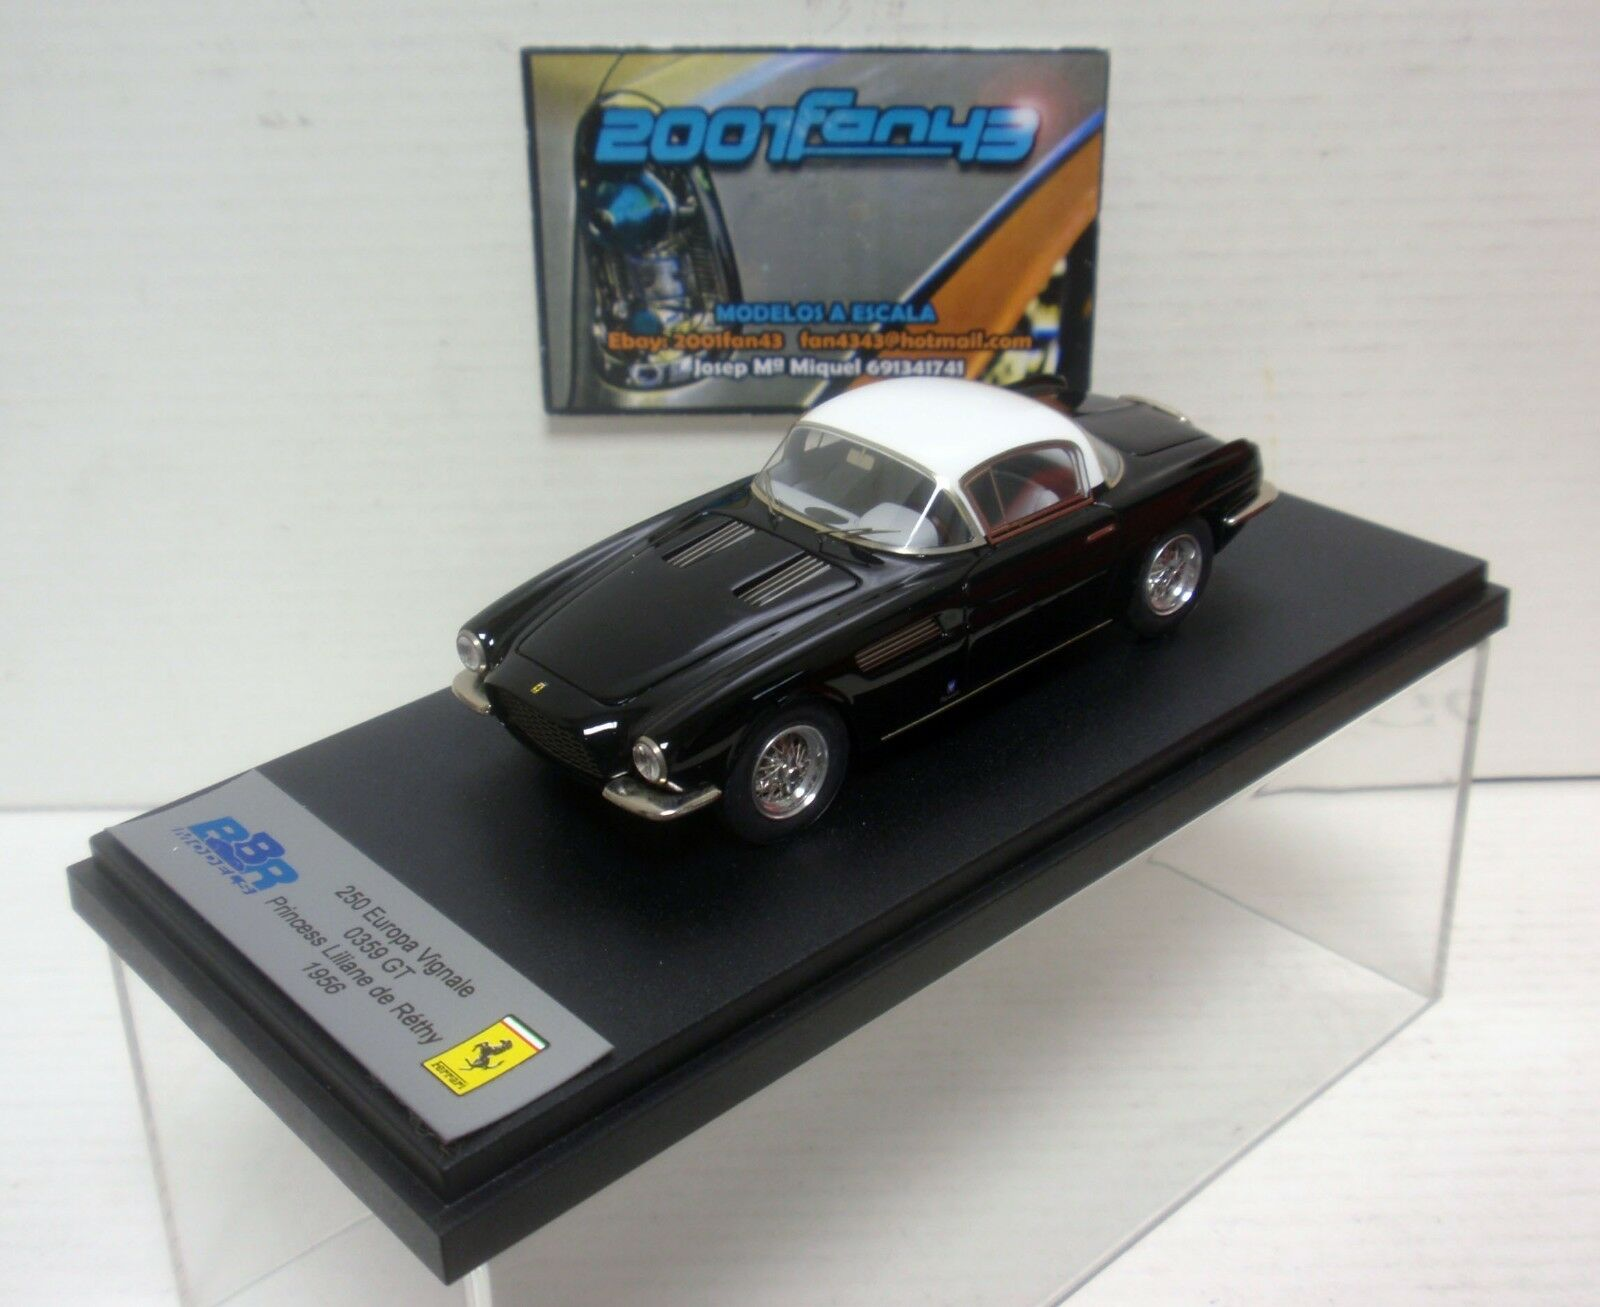 FERRARI 250 EUROPA VIGNALE 0359 GT 1956 LILIANE DE RETHY 1 43 BBR 105